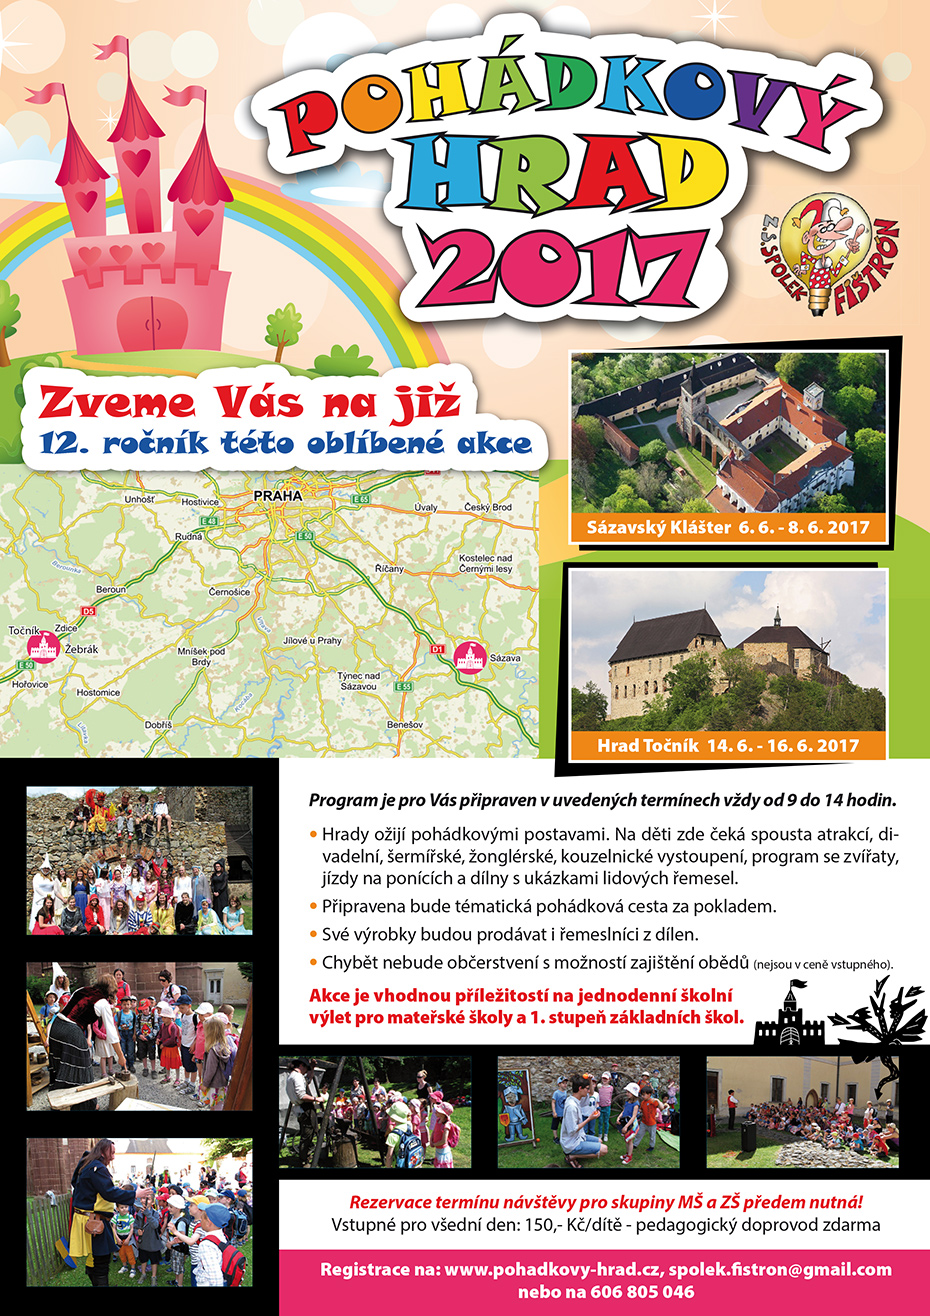 pohadkovy_hrad_2017